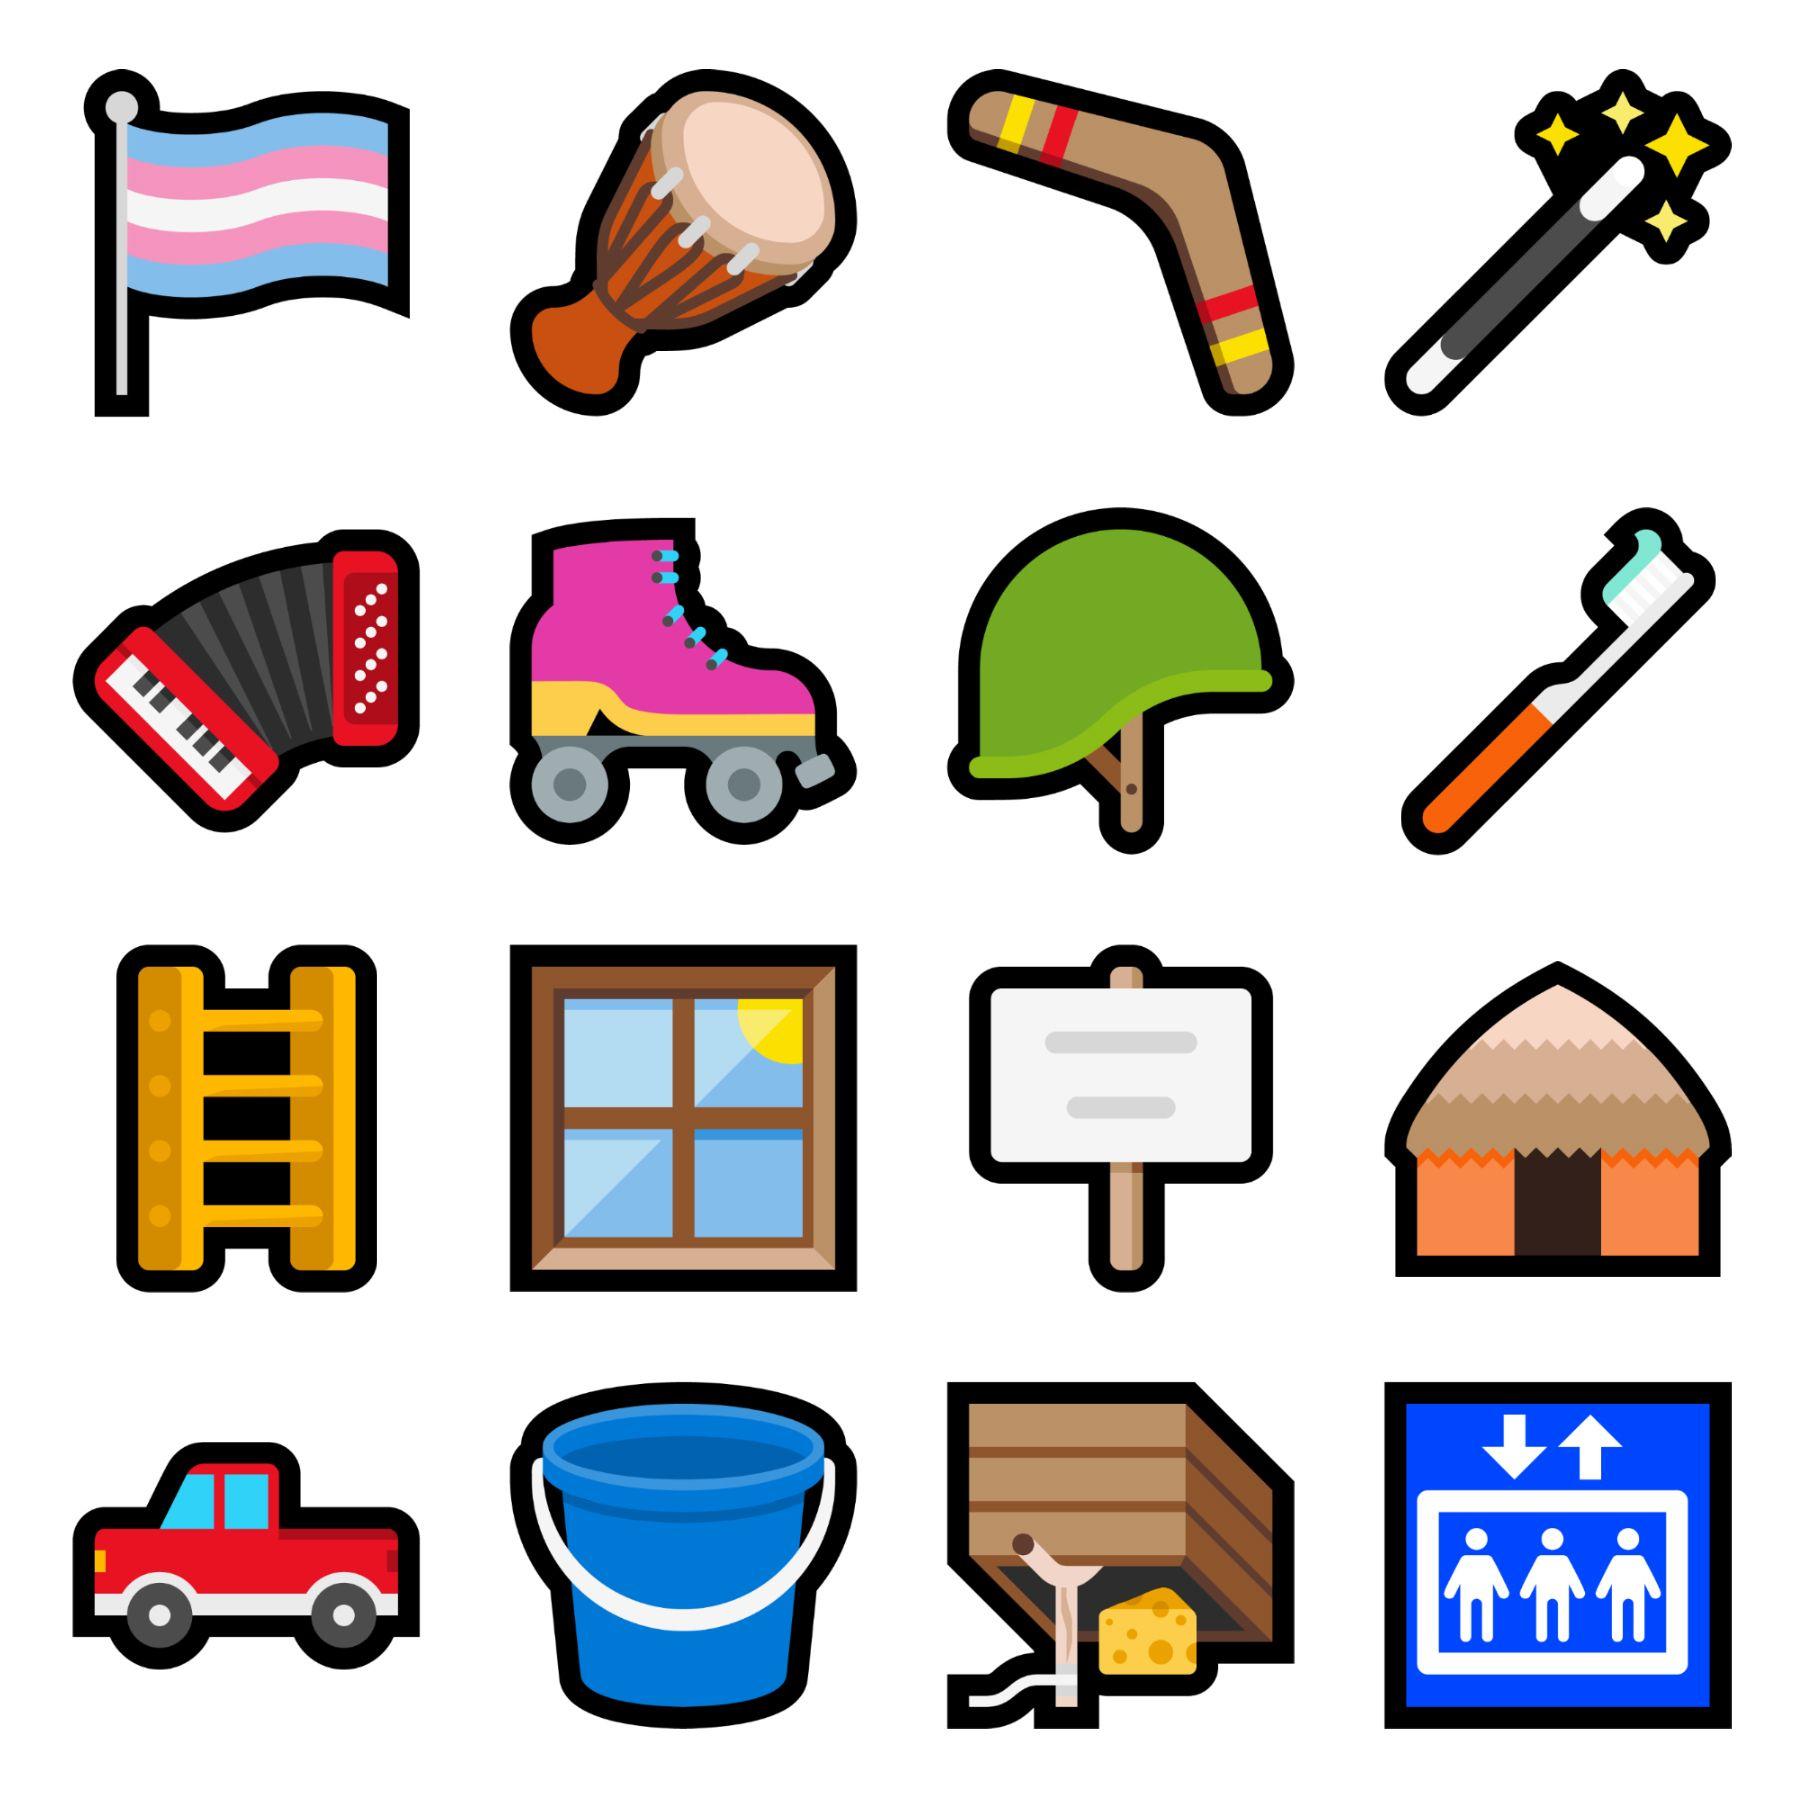 Emojipedia-Windows-11-New-Misc-Emojis